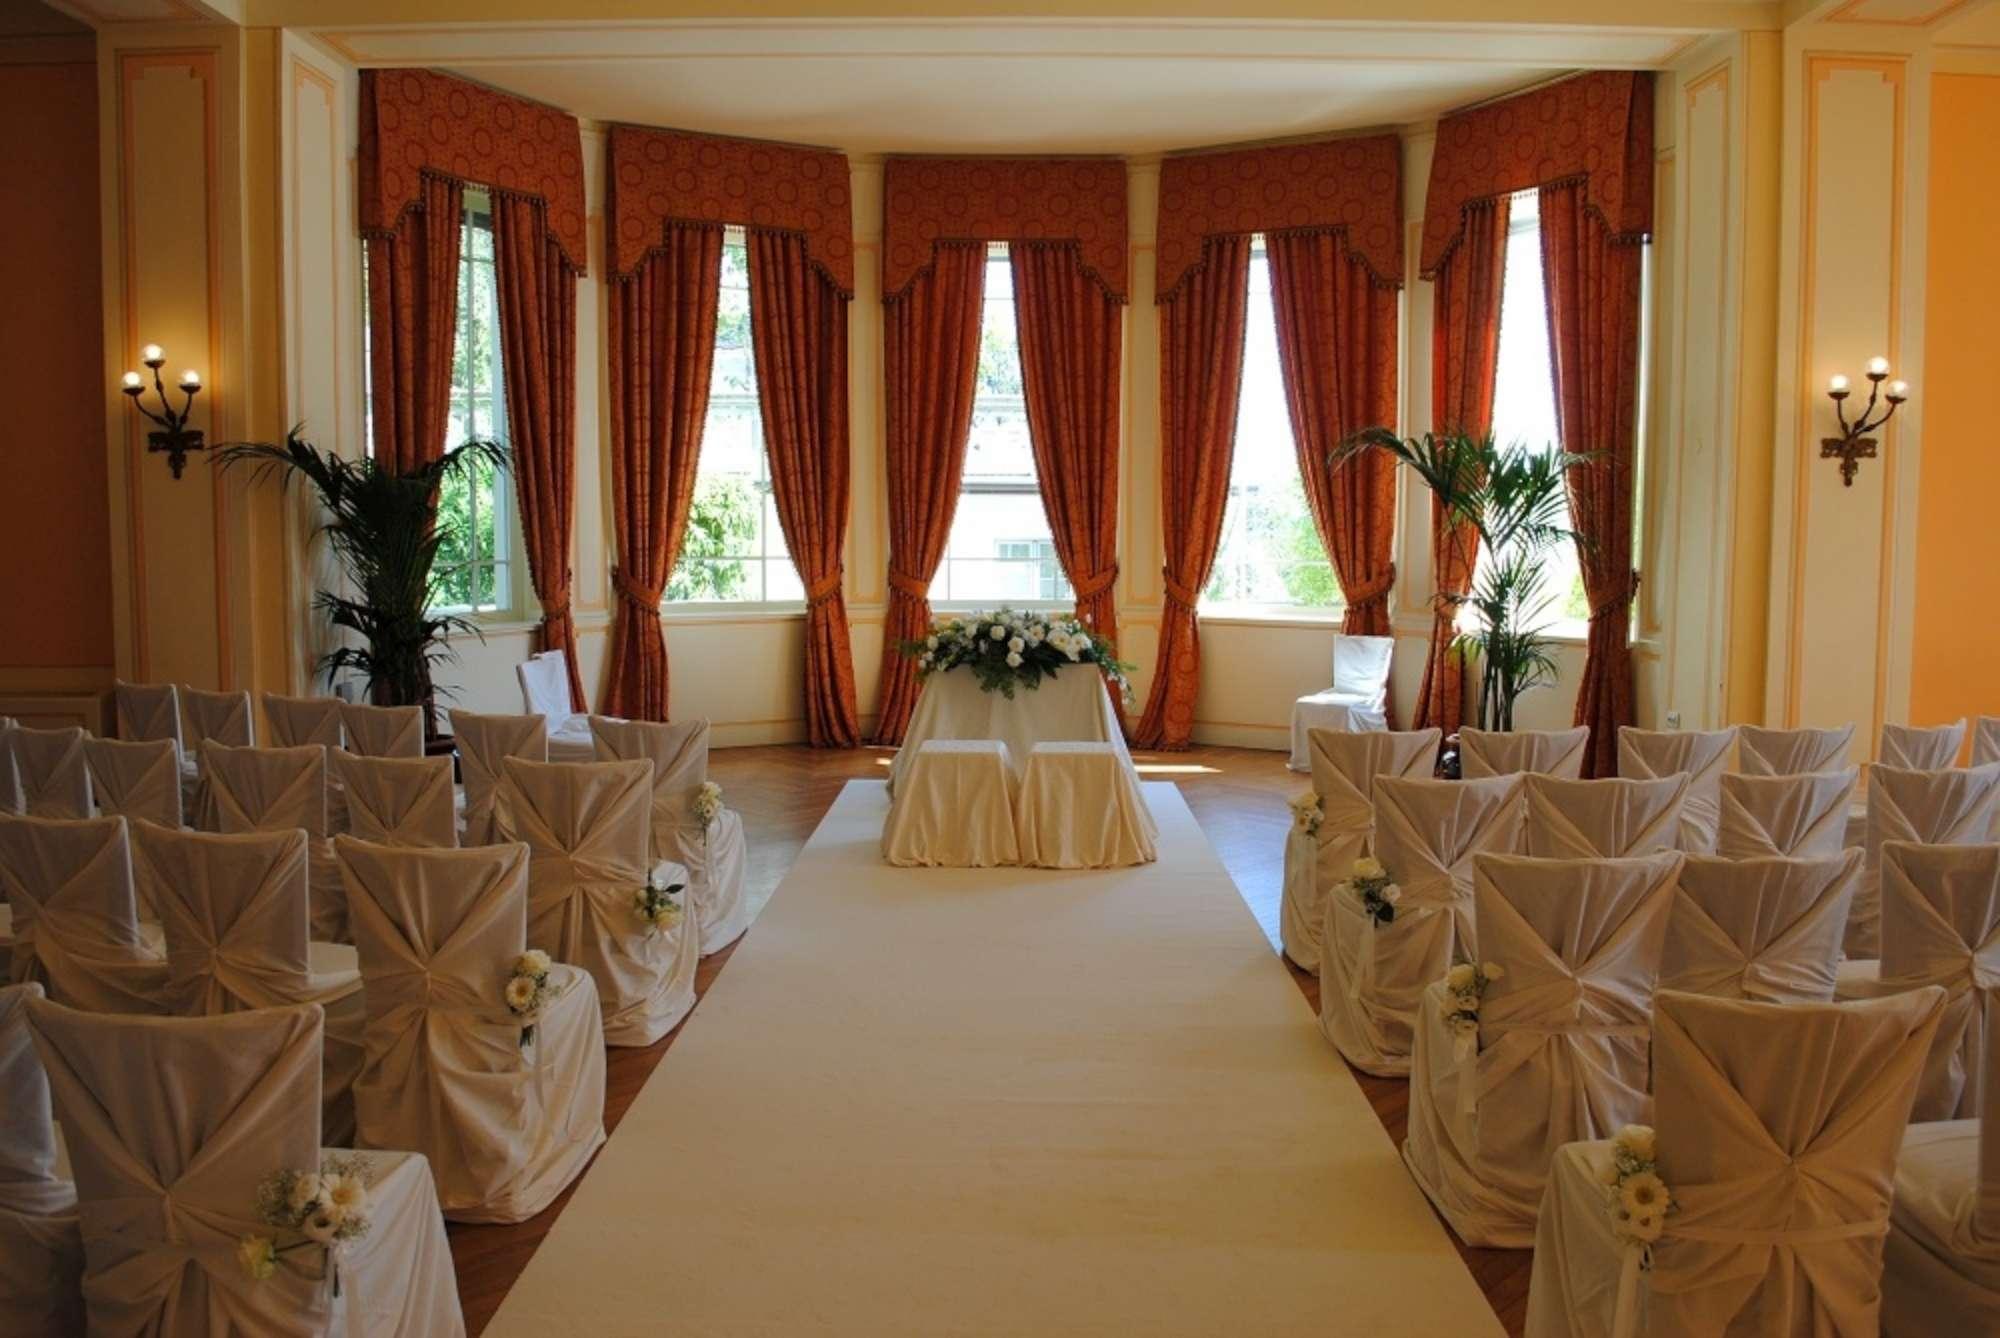 Grand Hotel Majestic cerimonia nozze